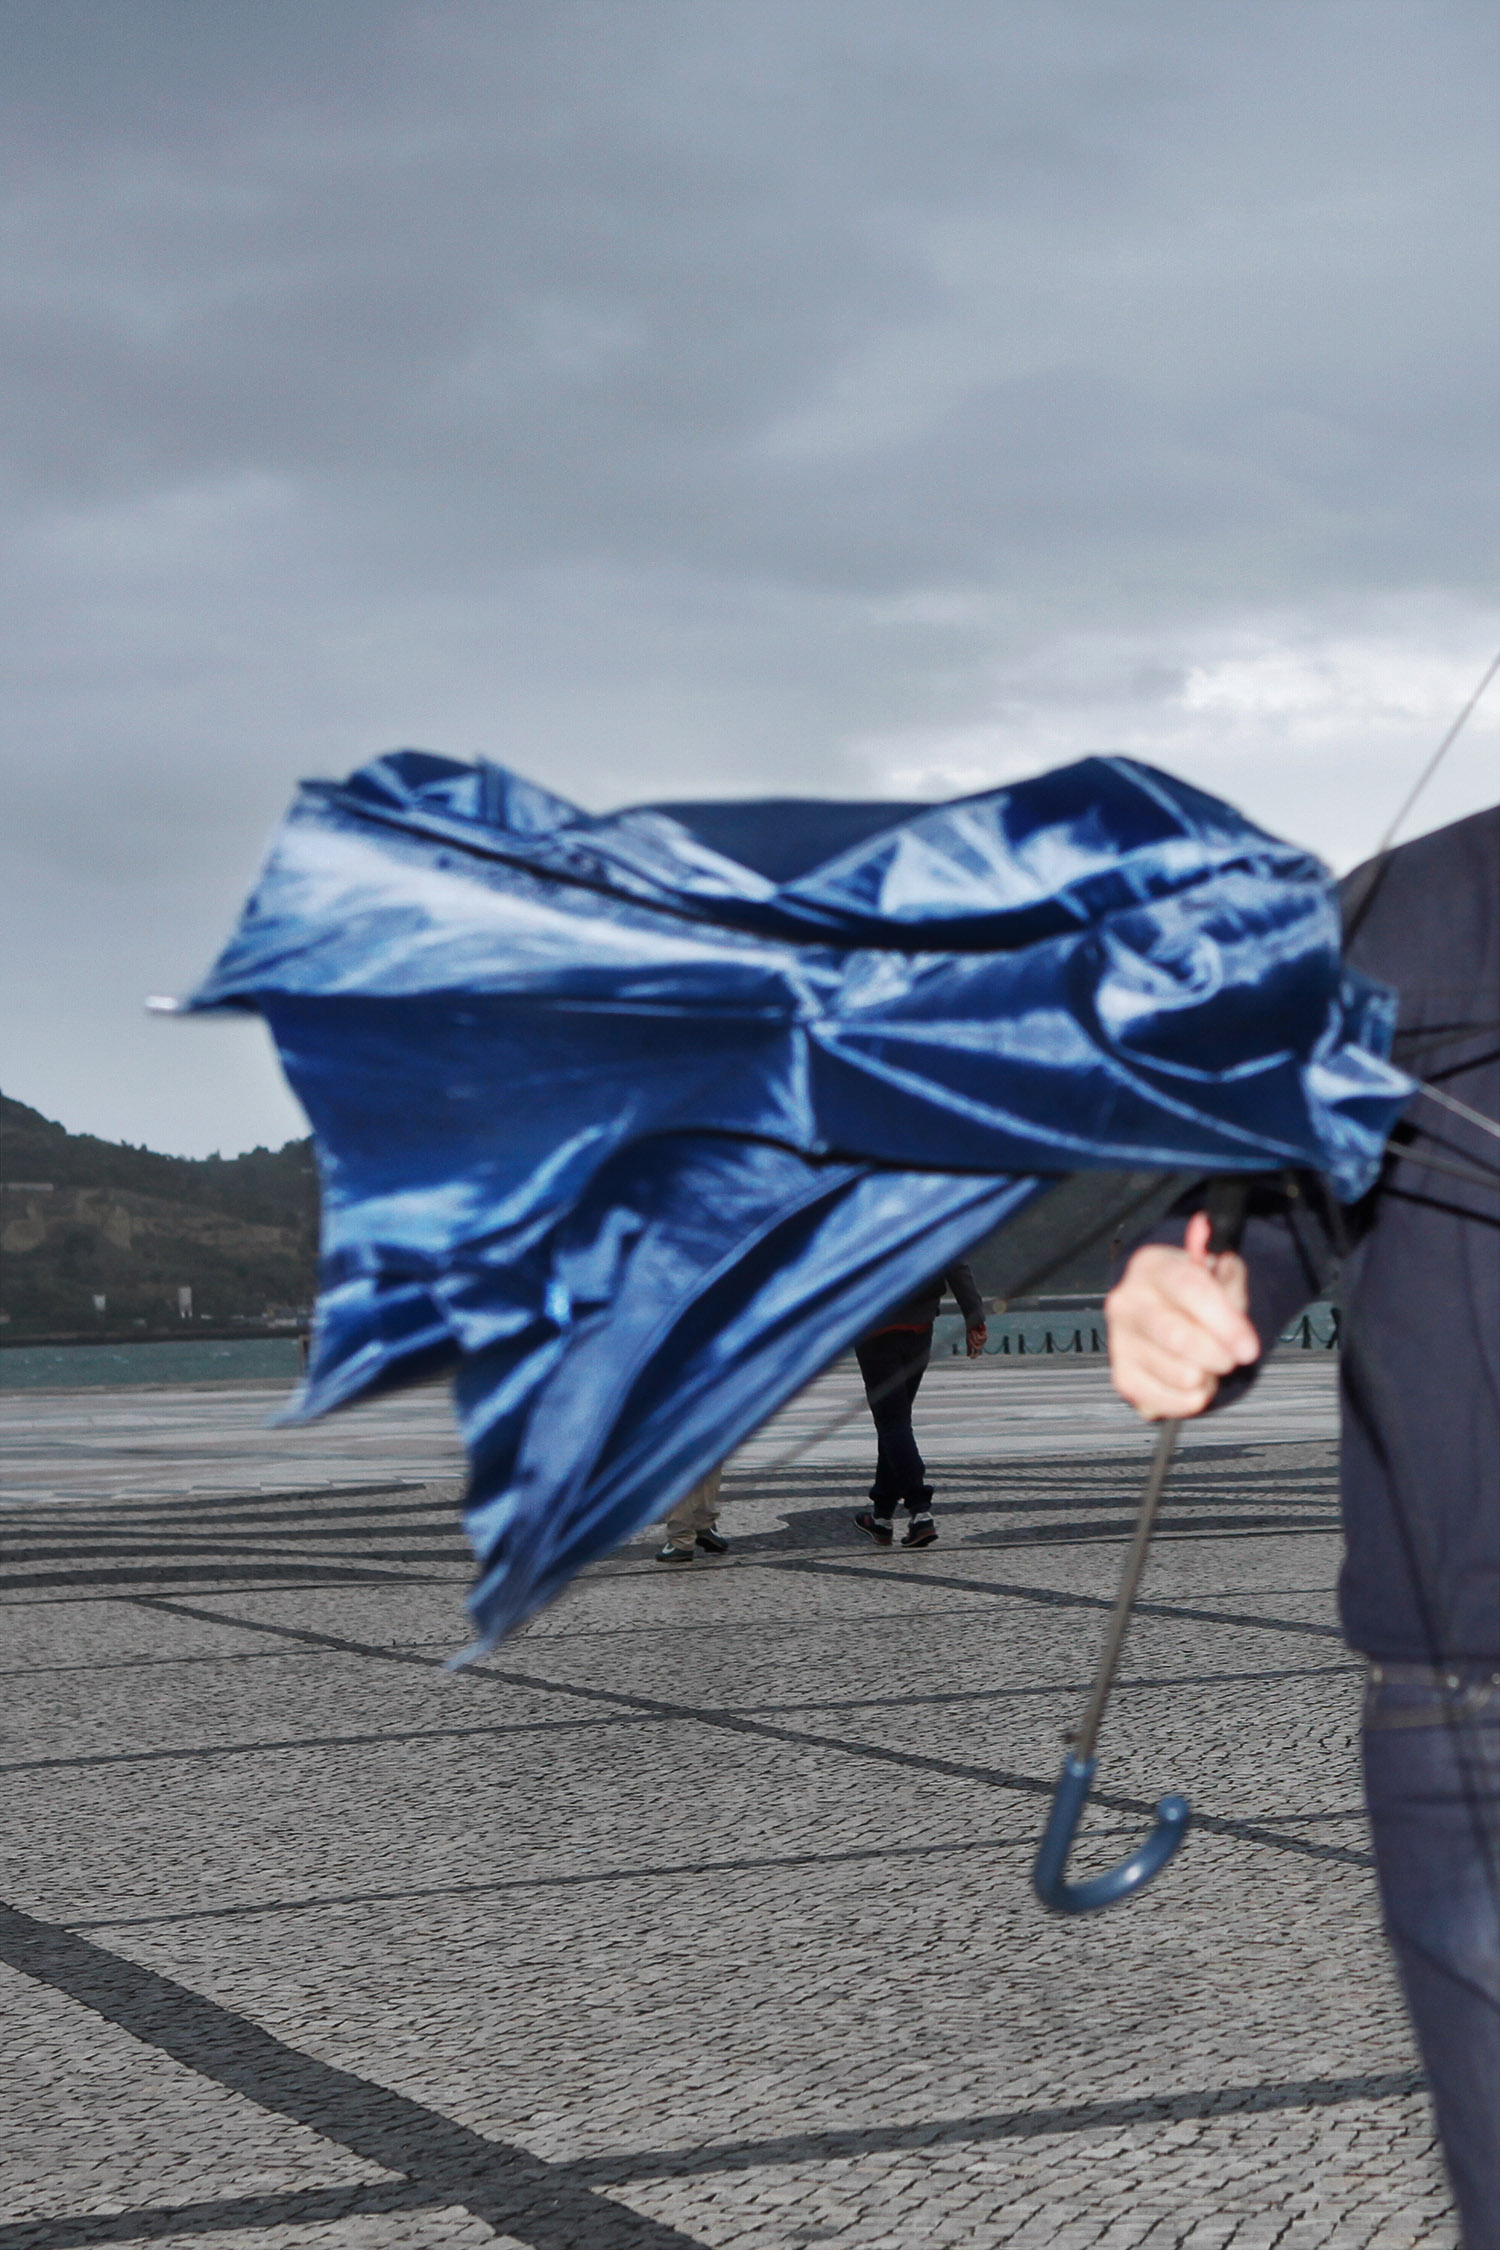 Justine Guerriat Microcosm series Blue Umbrella